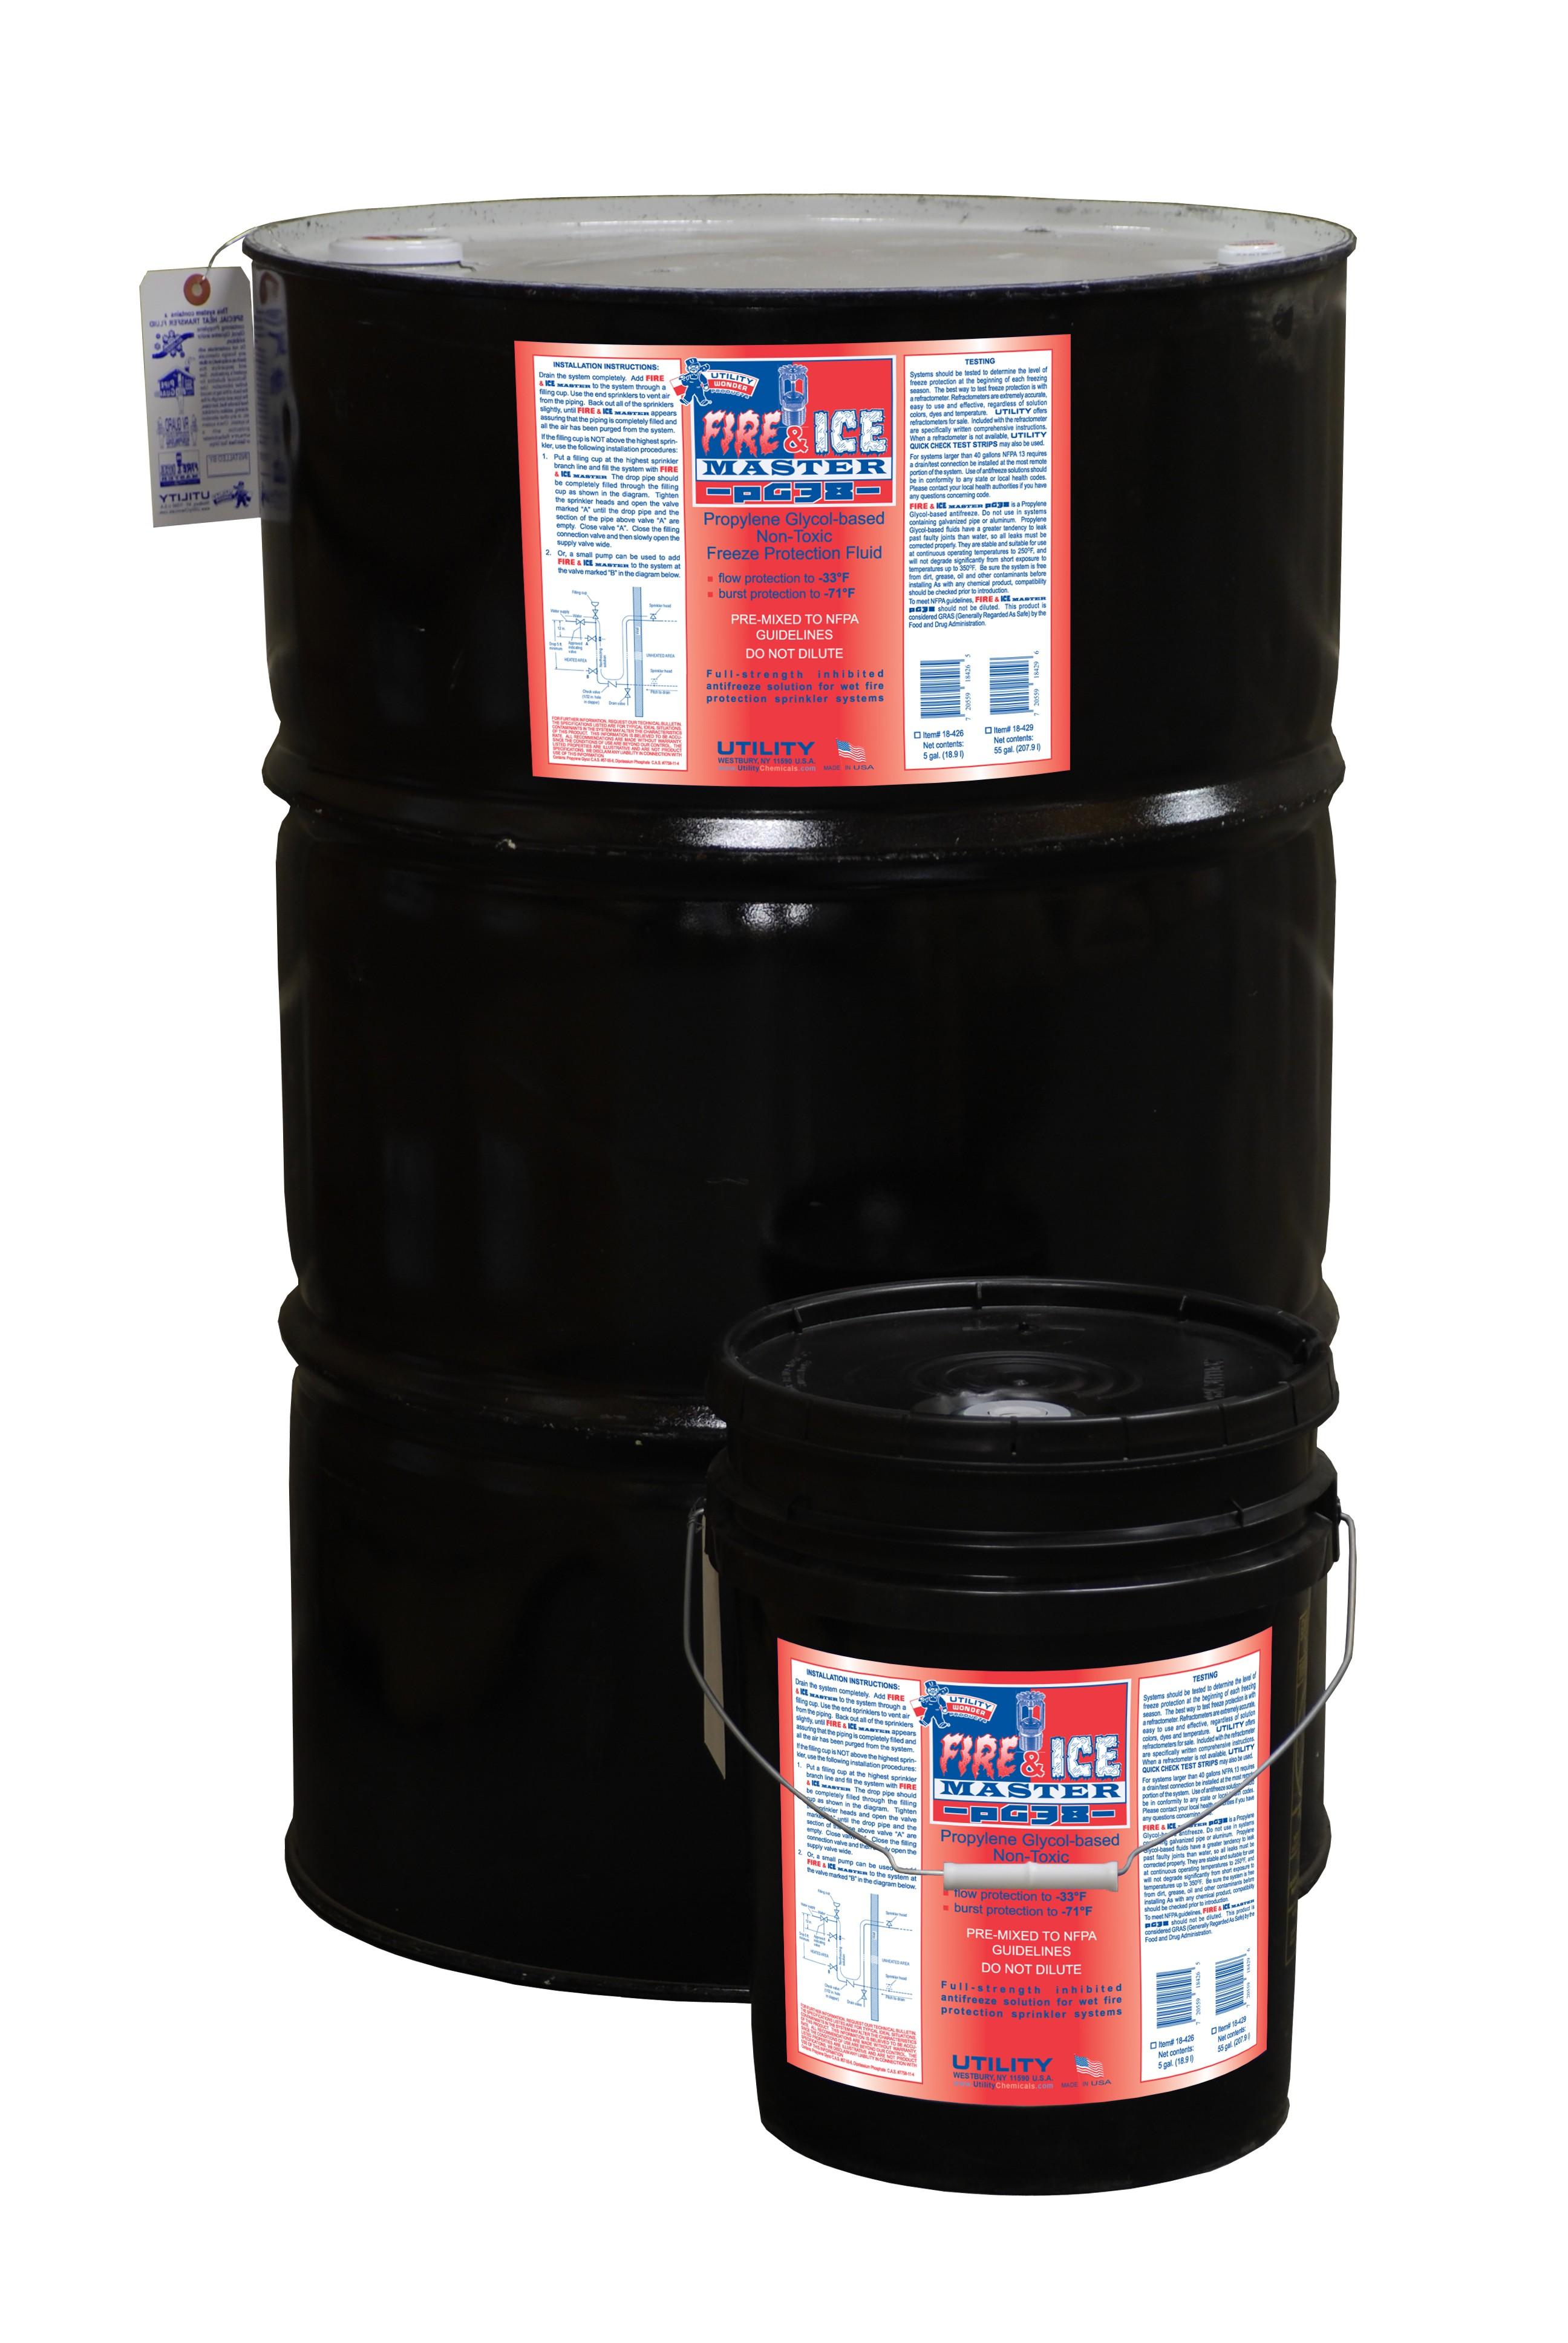 FIRE & ICE MASTER PG38 PROPYLENE GLYCOL-BASED FIRE SPRINKLER ANTI-FREEZE